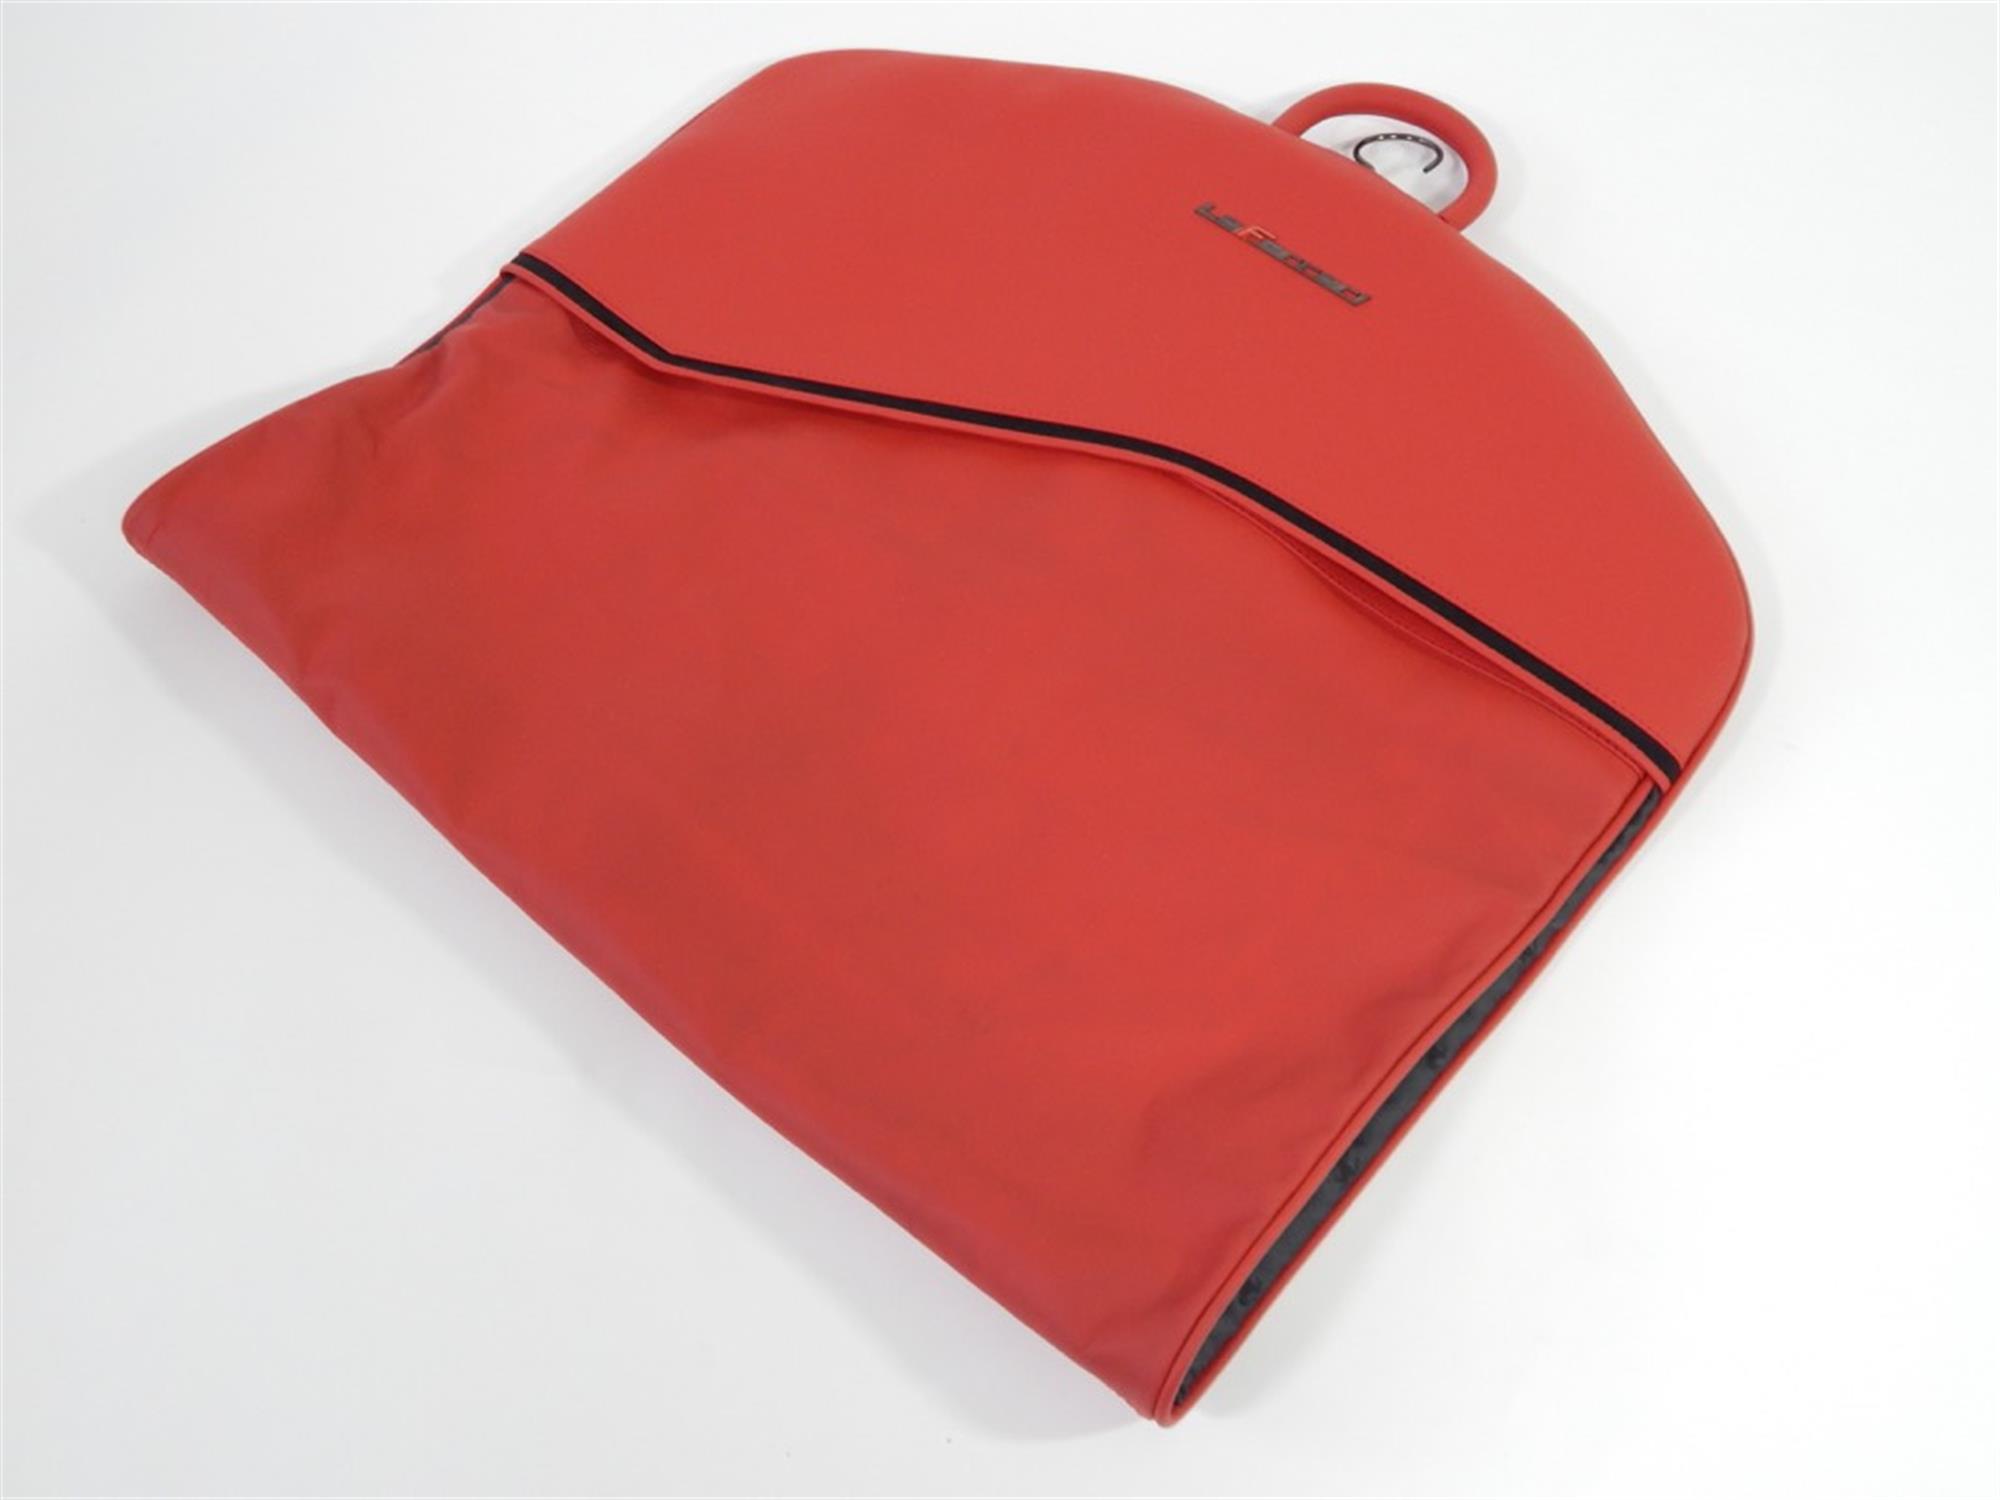 2013 - 2016 Ferrari LaFerrari 2 Piece Complete Schedoni Luggage Set - Image 3 of 10